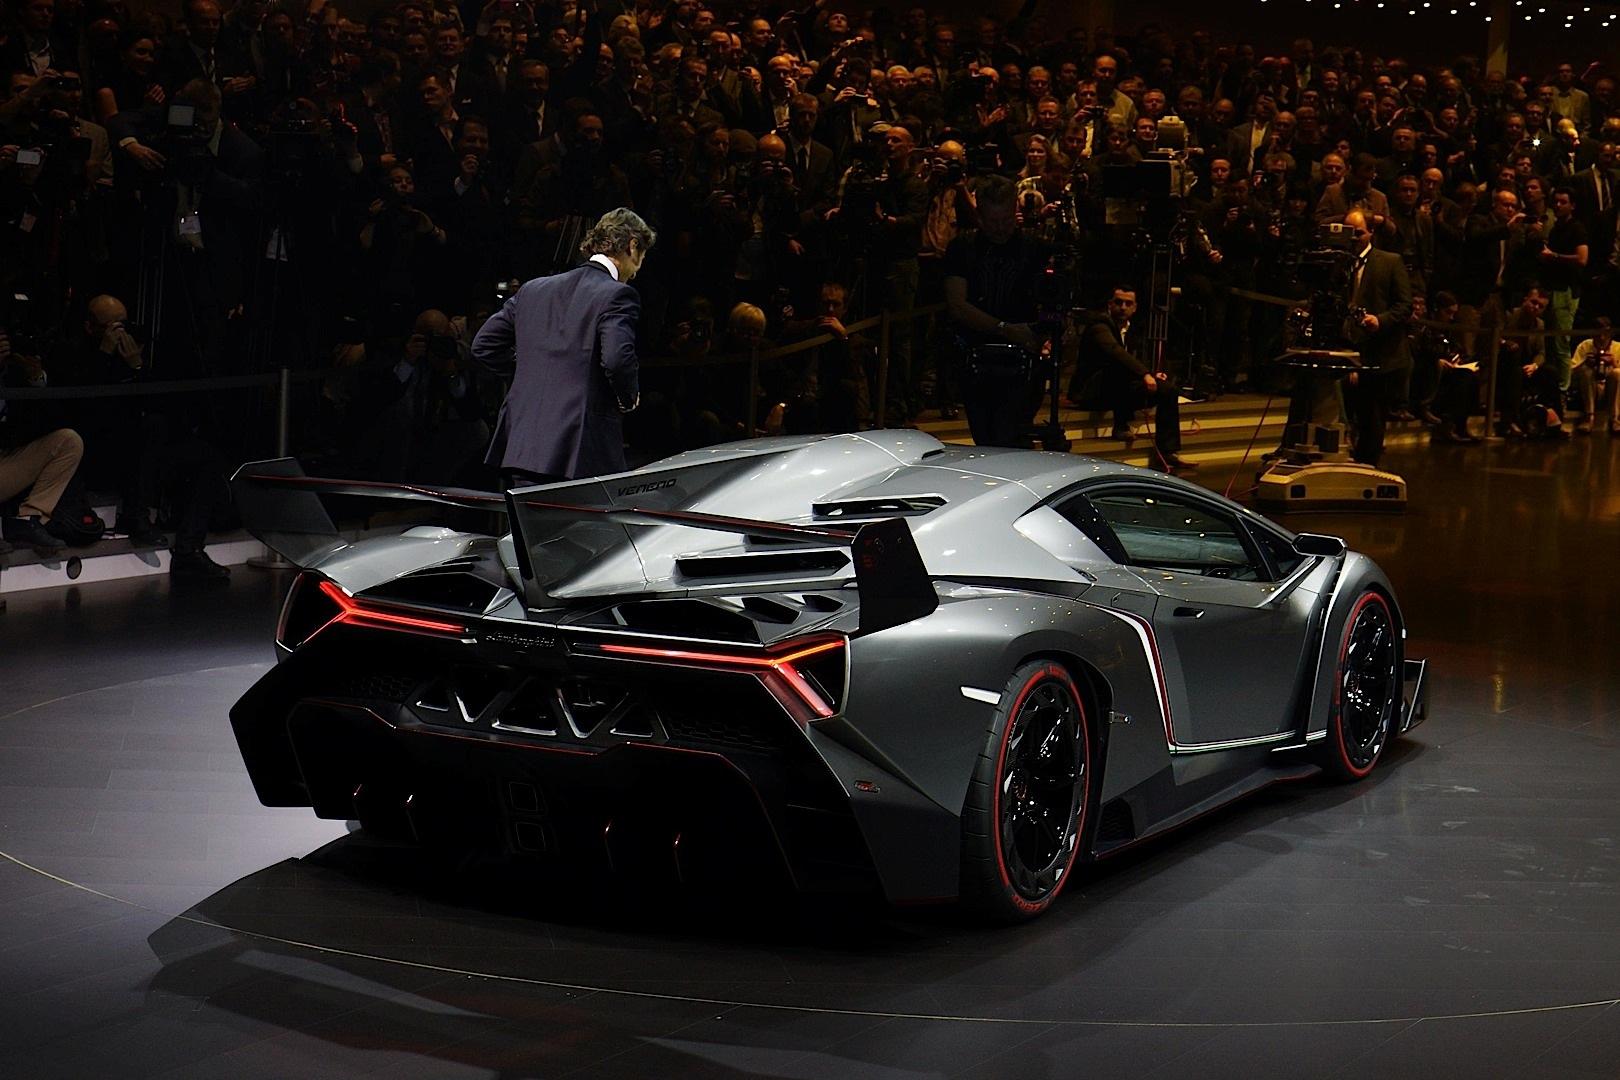 Dubai Police Car Wallpapers Lamborghini Veneno Named World S Ugliest Car Autoevolution